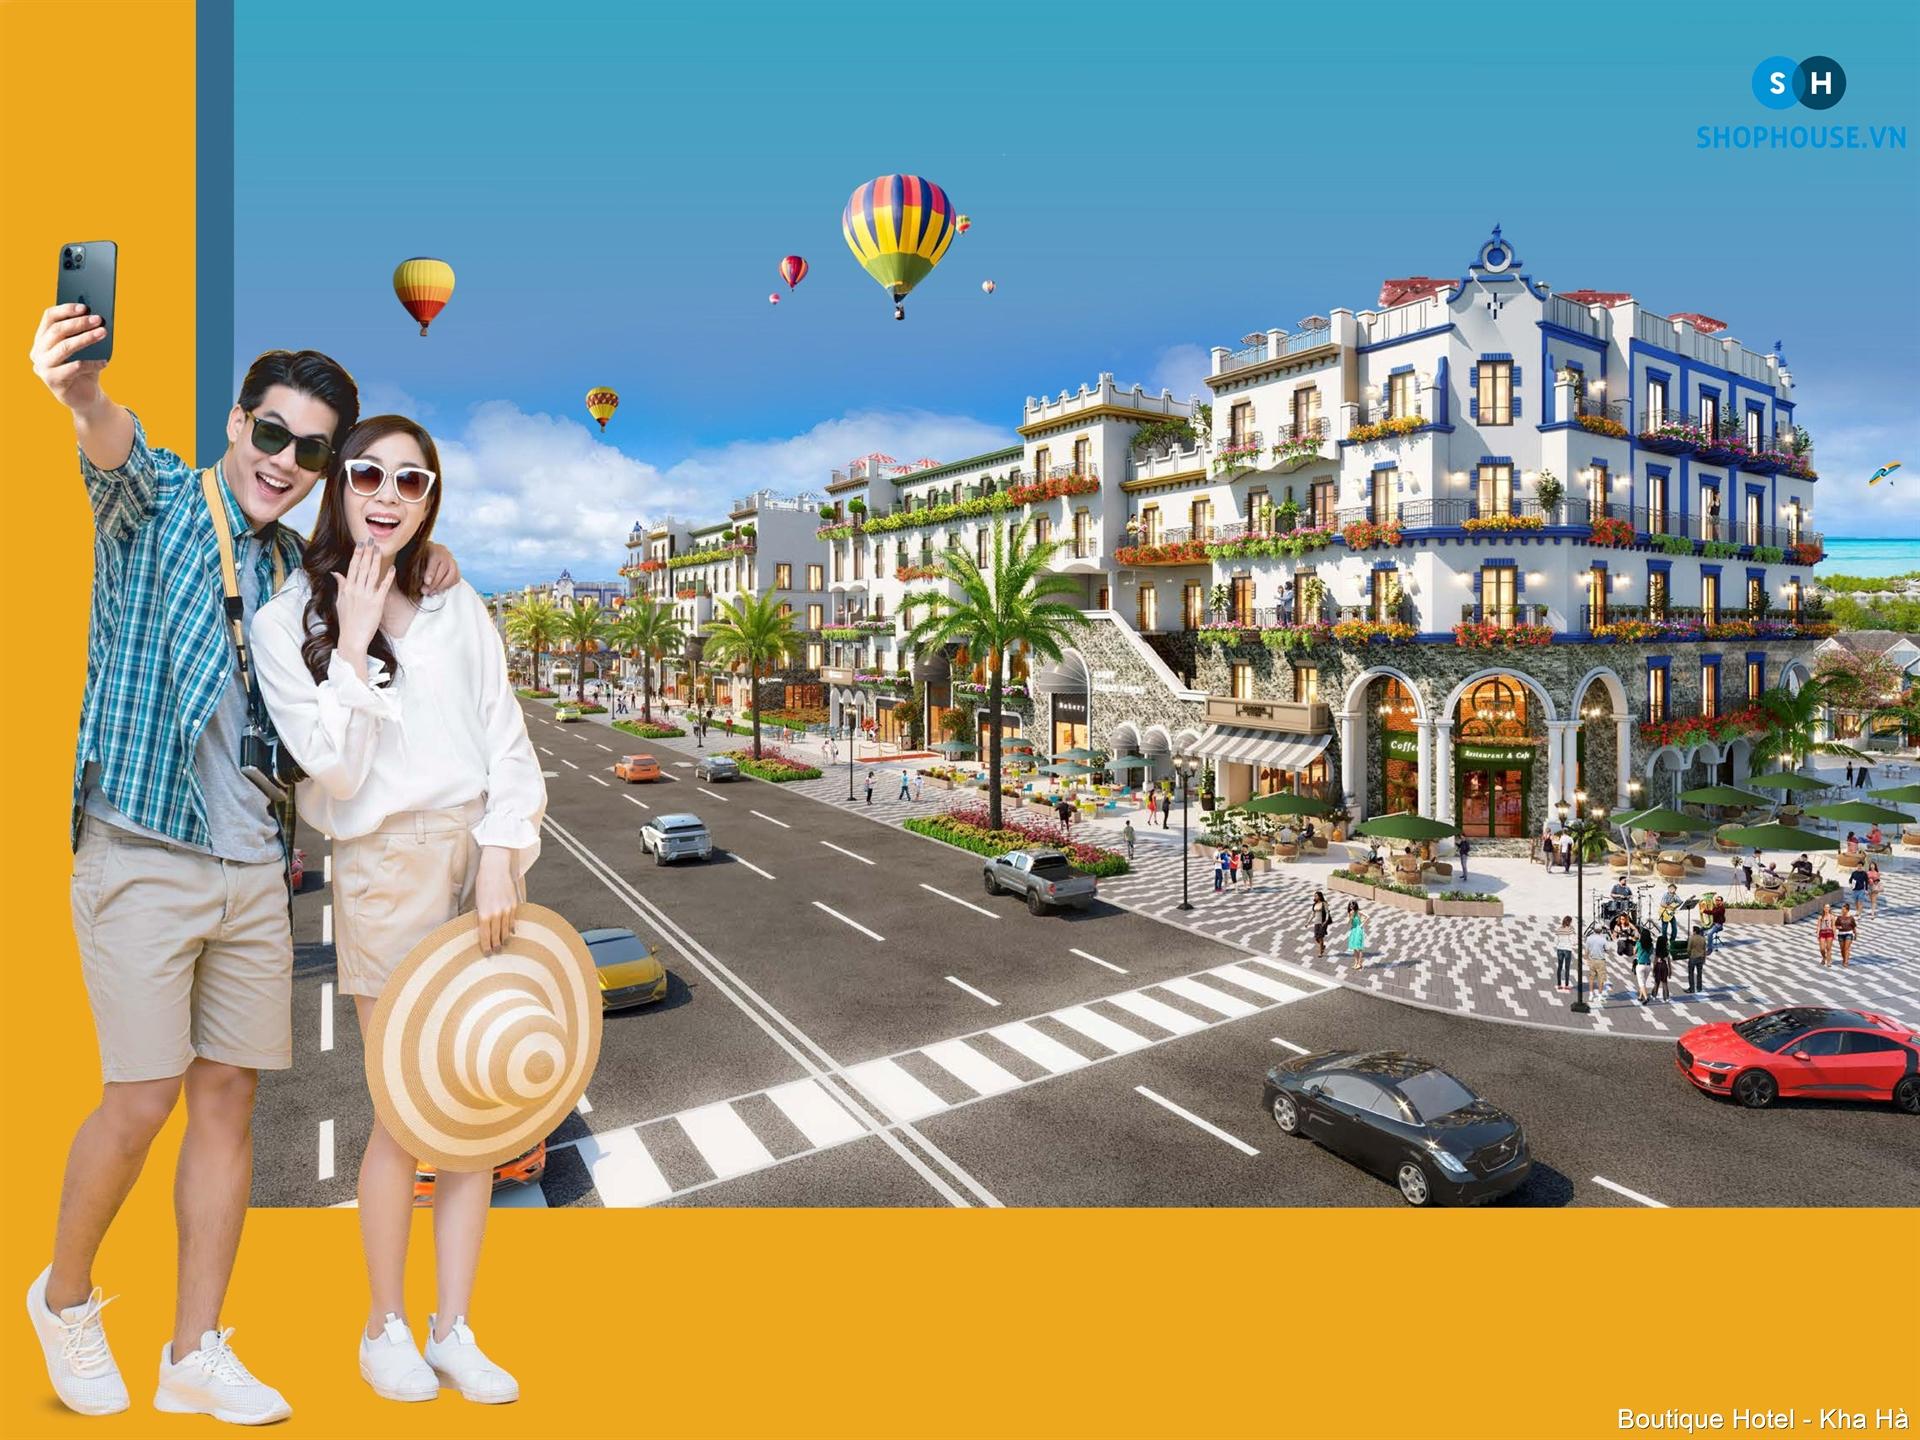 banner-Boutique-Hotel-Florida-1-NovaWorld-Phan-Thiet